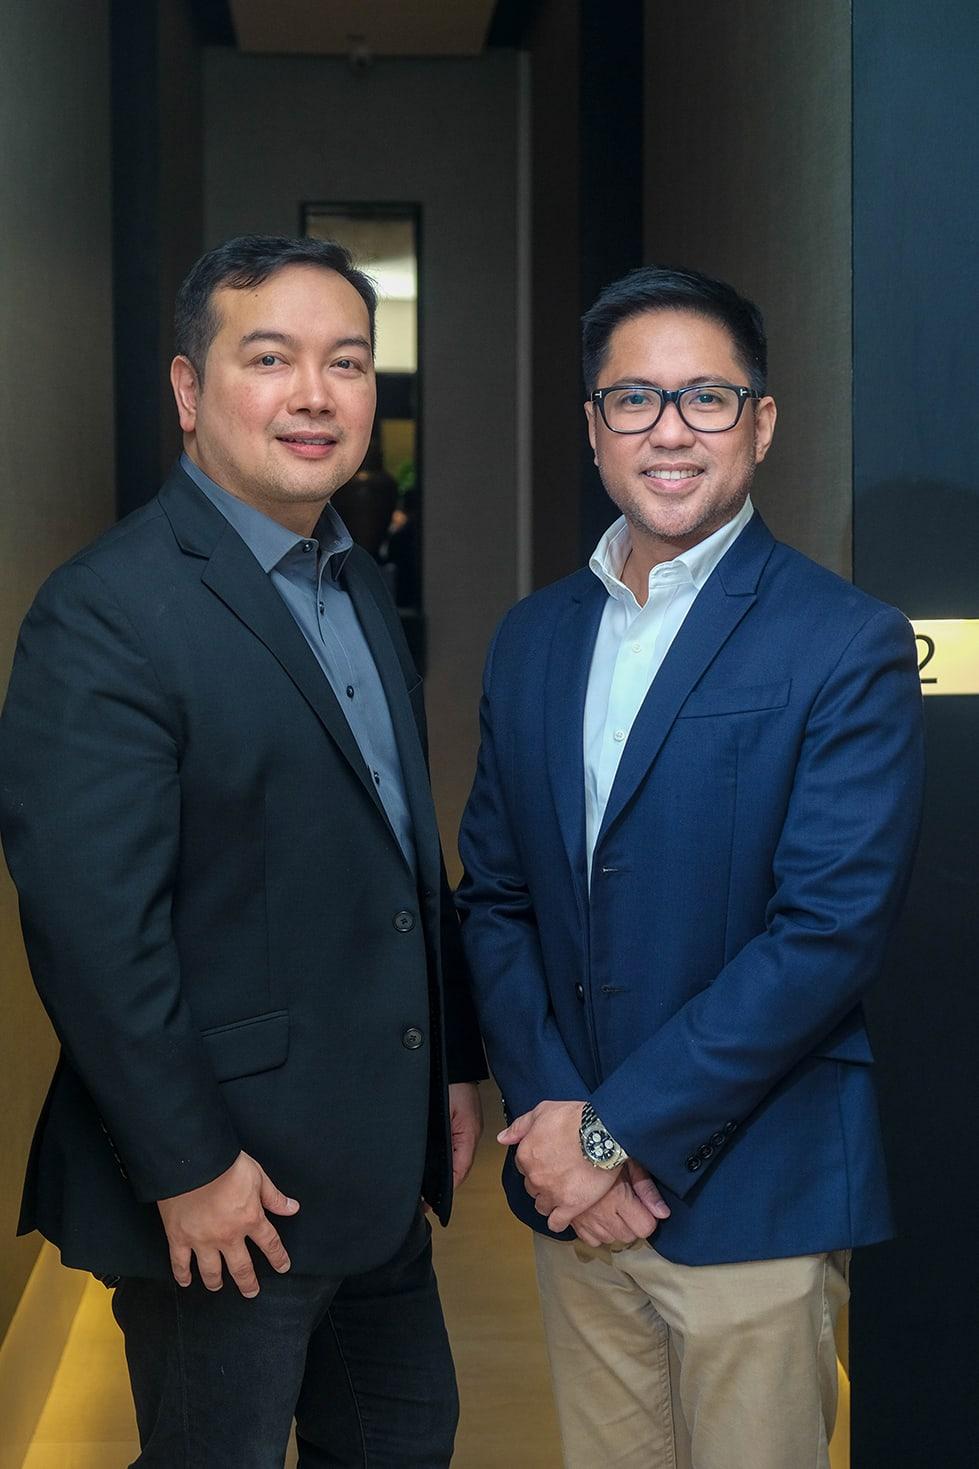 Marco Protacio and Dr. Arnelle Quiambao